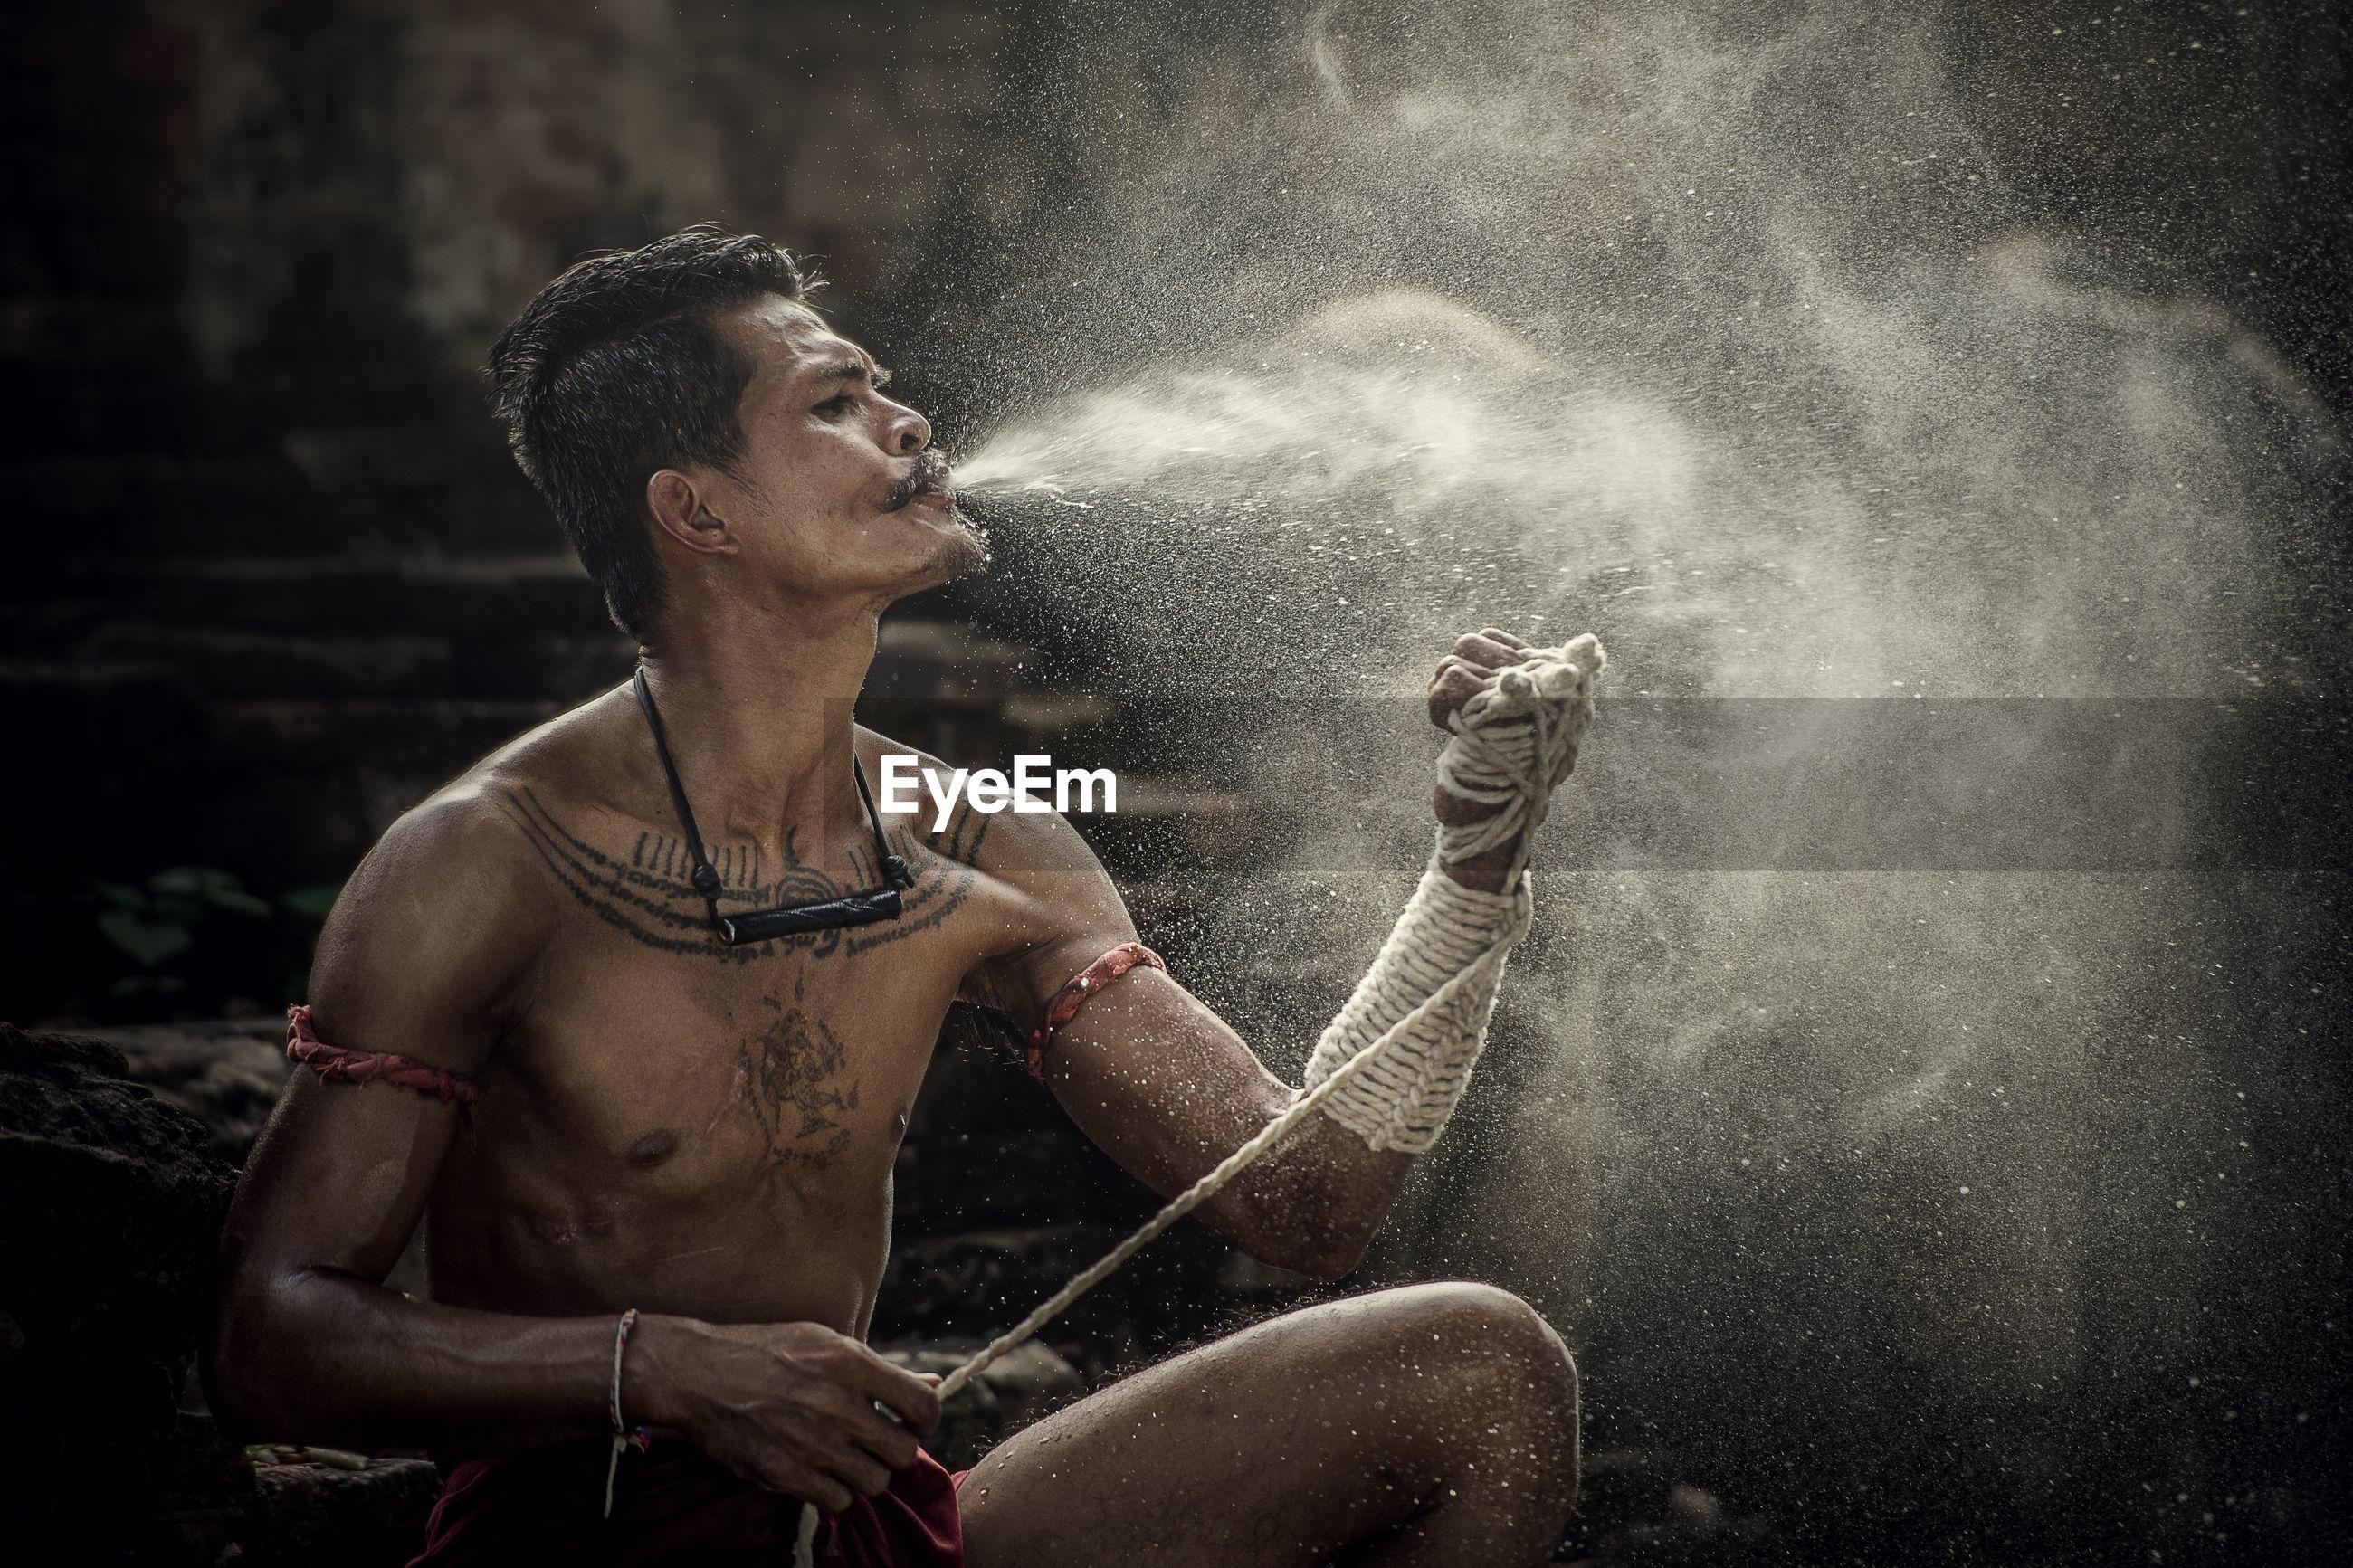 Man spraying water on hand